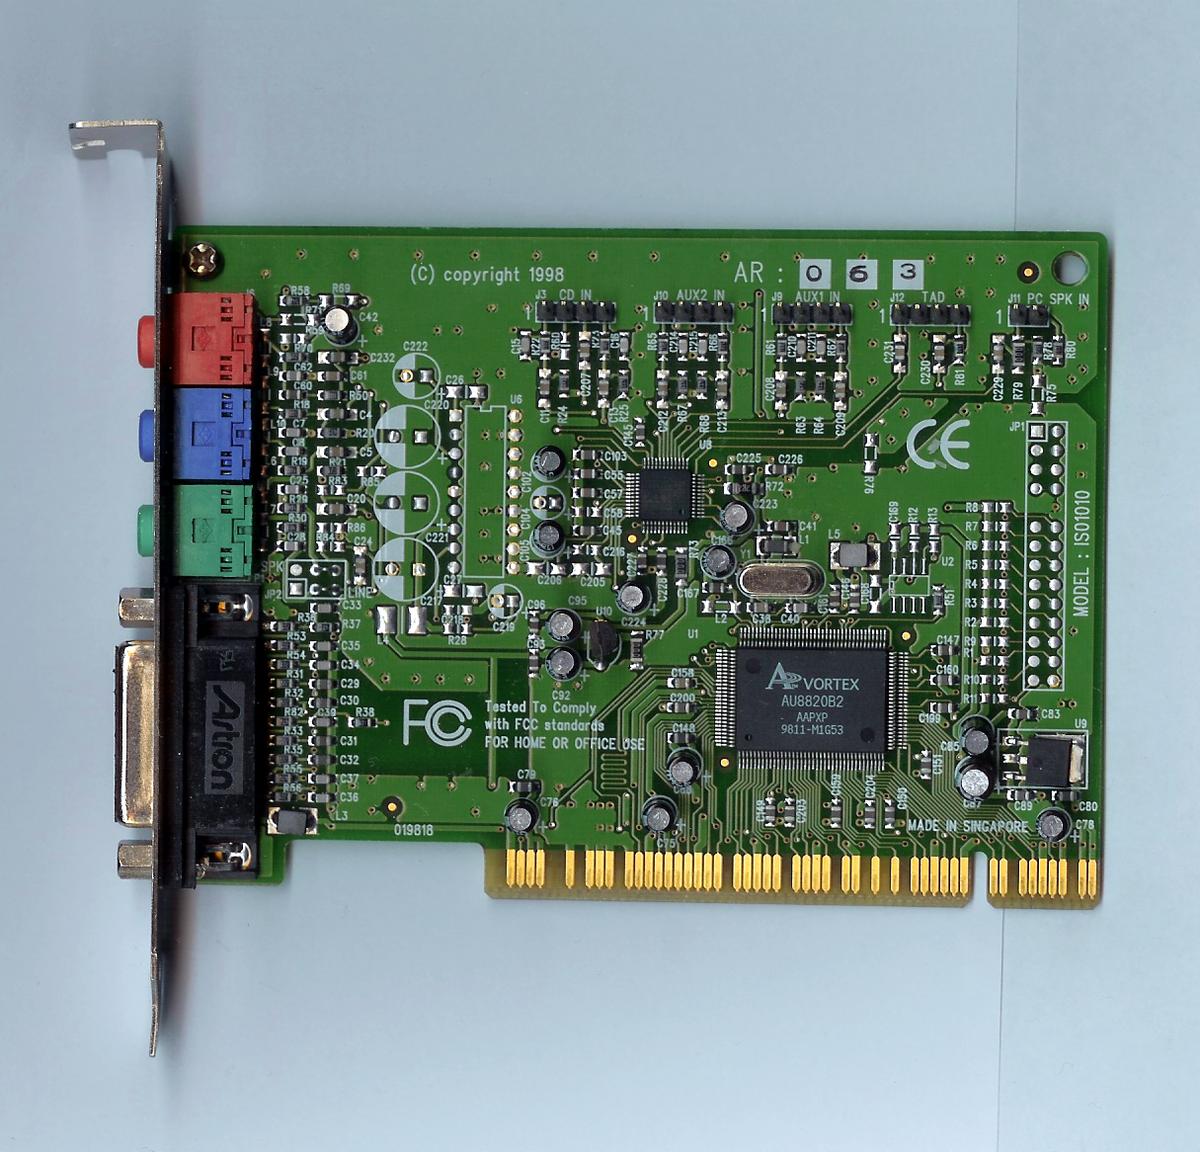 Vortex 8820 download drivers.